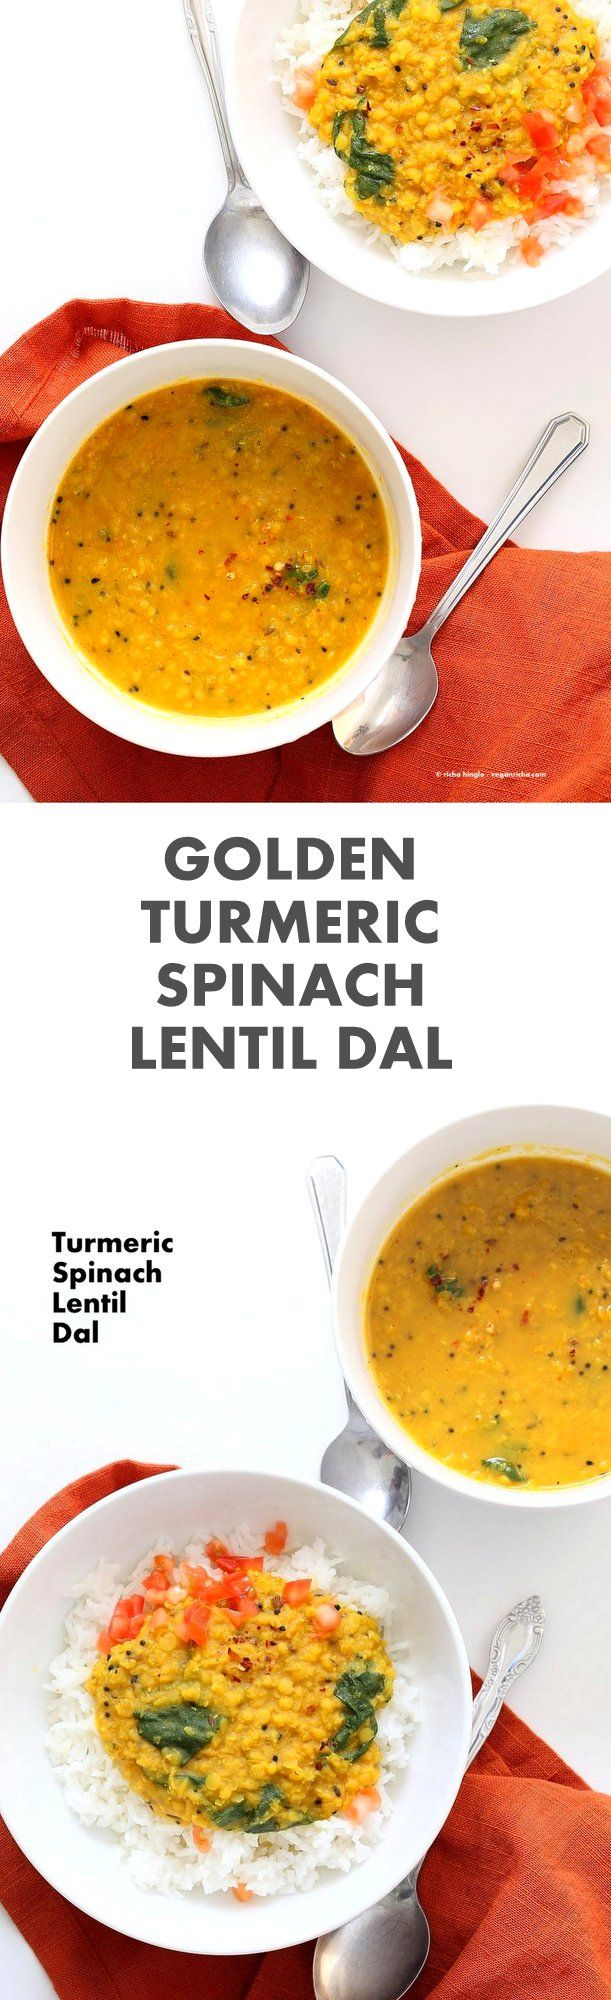 Turmeric Spinach Lentil Dal - Red Lentil Soup. Easy Lentil Soup with turmeric and greens. No garlic no onion Dhal. Golden Lentil Dal. #Vegan #Glutenfree #Soyfree #Recipe.| VeganRicha.com